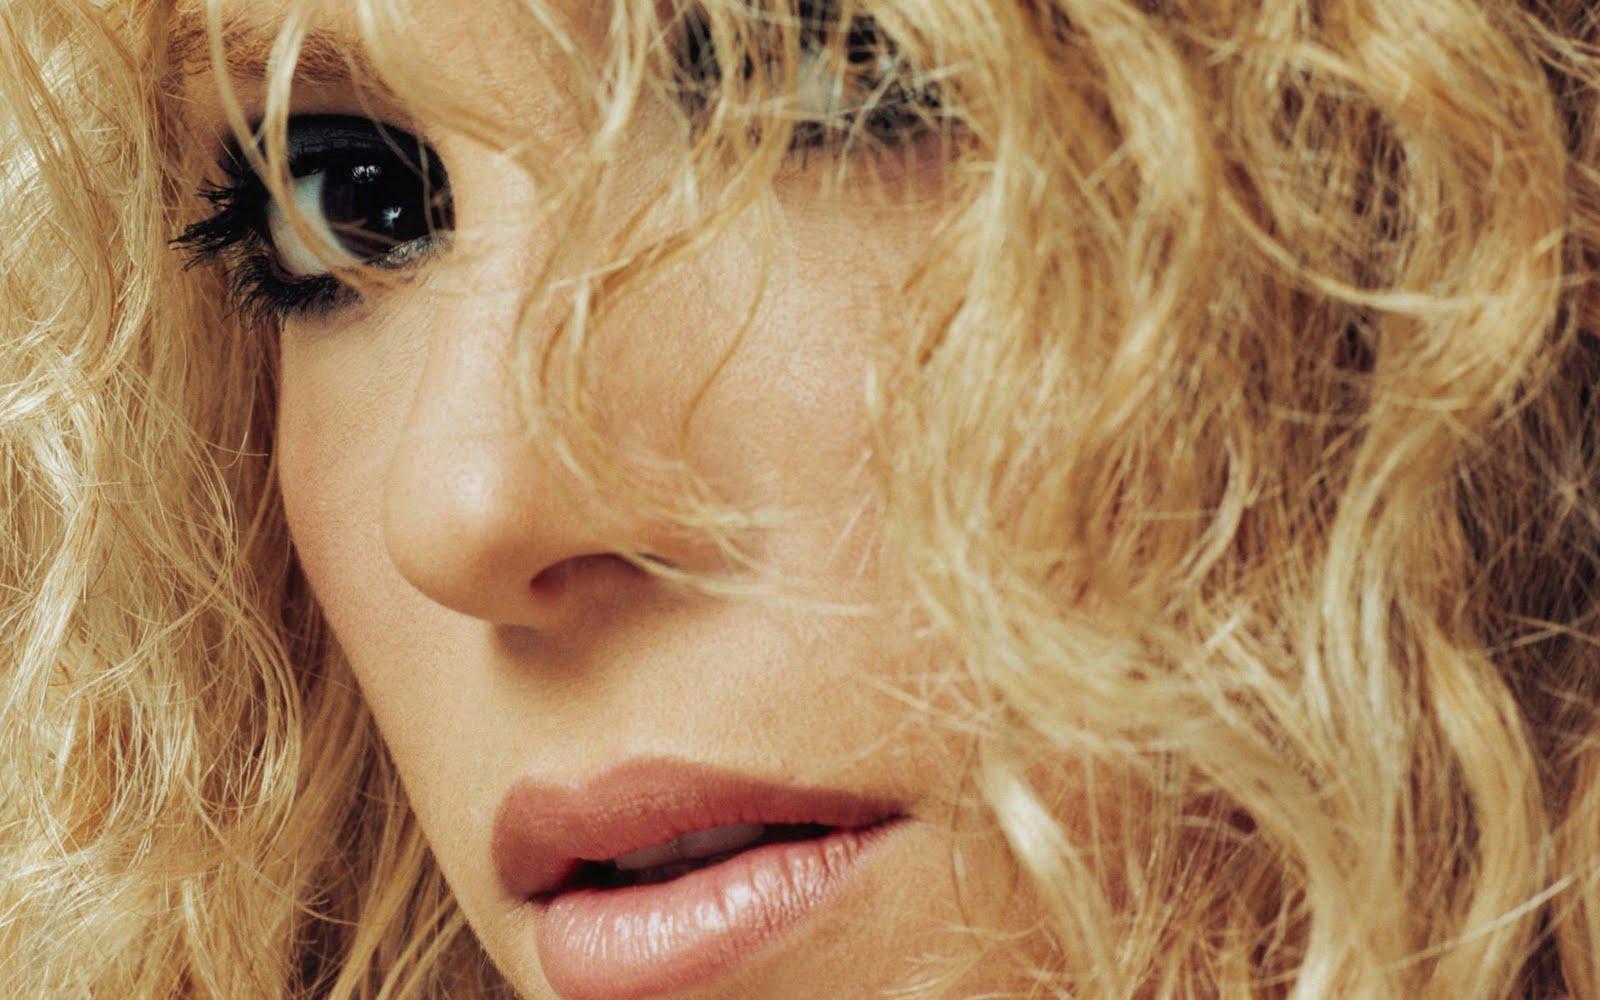 http://4.bp.blogspot.com/-qjUbYG1fyls/UWUTxk5fAQI/AAAAAAAAC1U/90b0IcP0bDE/s1600/Shakira+hd+latesty+new+(1).jpg